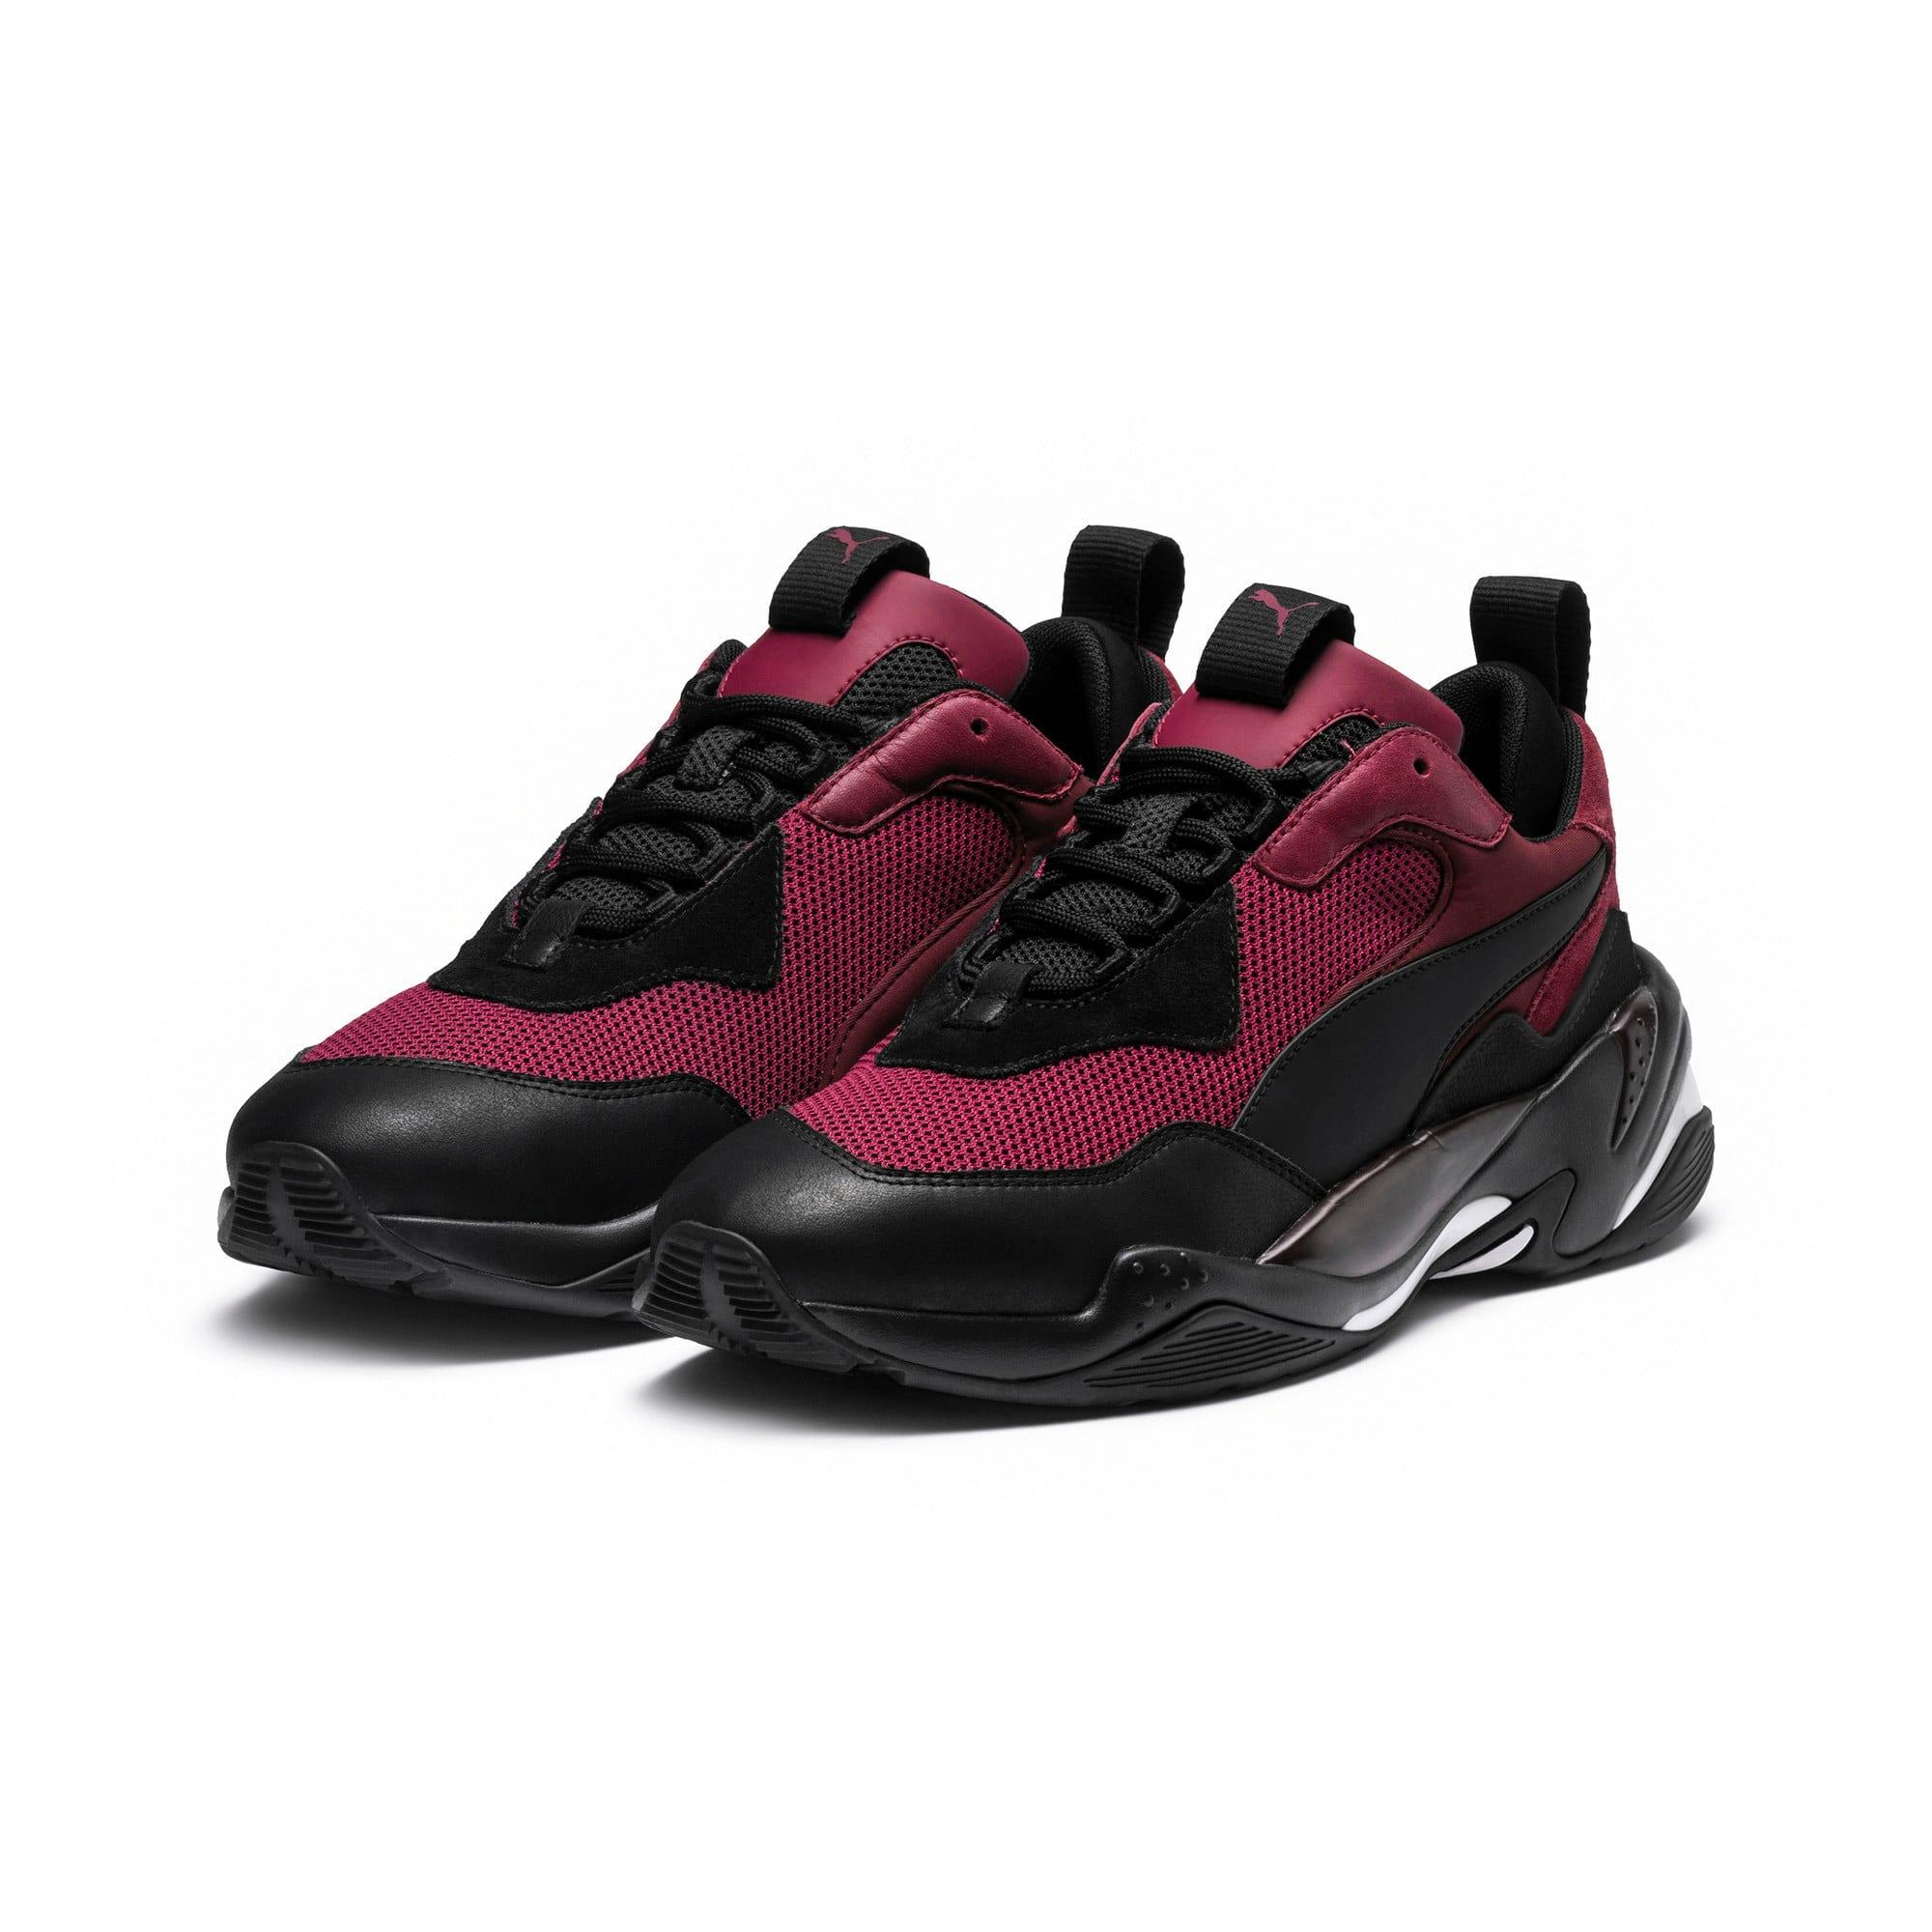 Miniatura 2 de Zapatos deportivosThunder Spectrapara hombre, Rhododendron-P Black-T Port, mediano